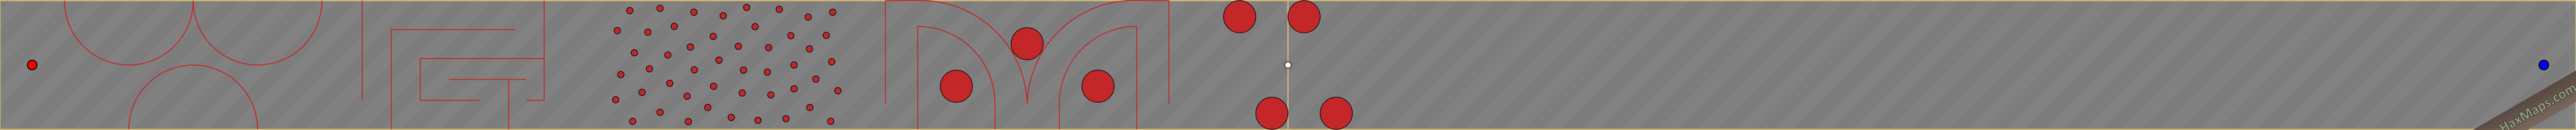 hax ball maps | Drichny - Easy